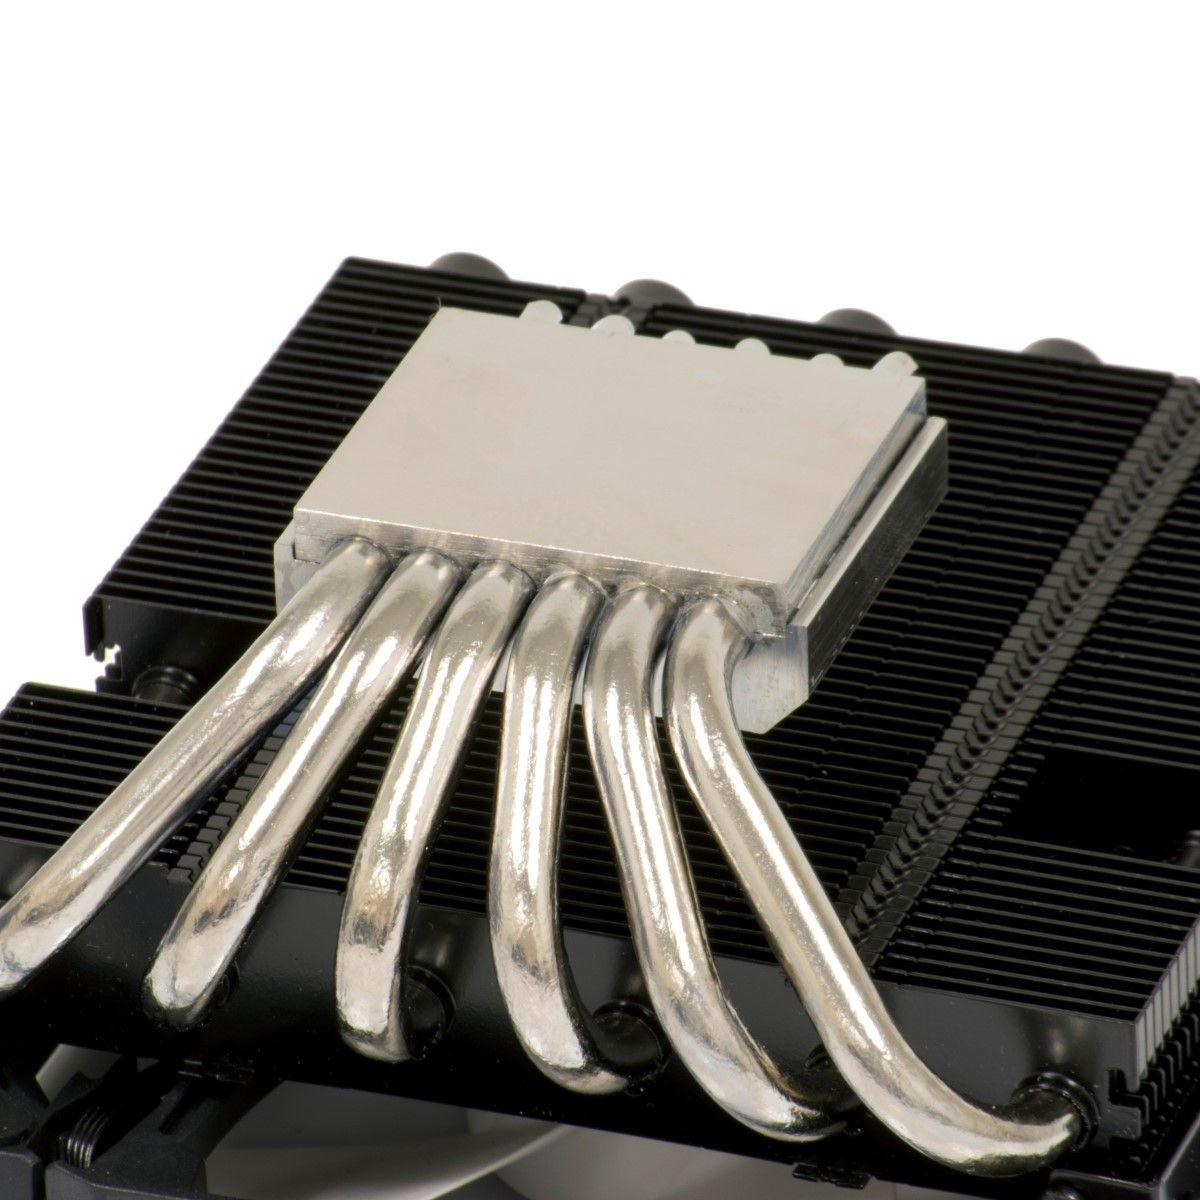 PHANTEKS PH-TC12LS 120MM CPU COOLER PH-TC12LS_BK